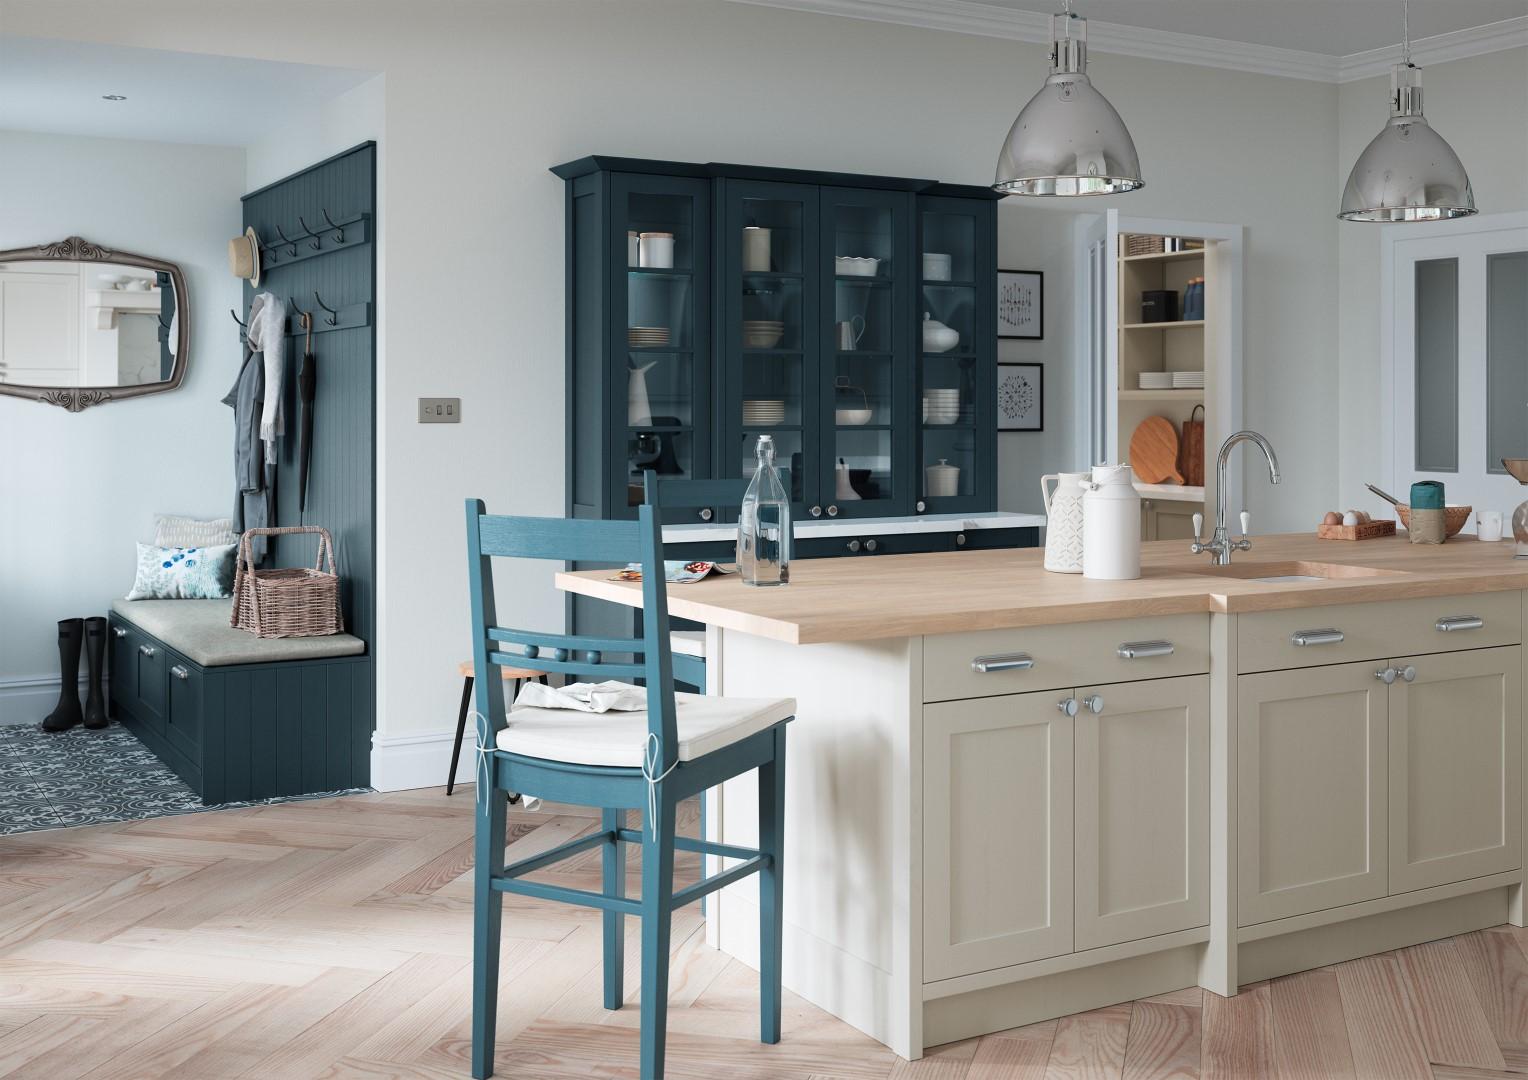 Aldana Stone and Marine - Kitchen Design - Alan Kelly Kitchens - Waterford - 3